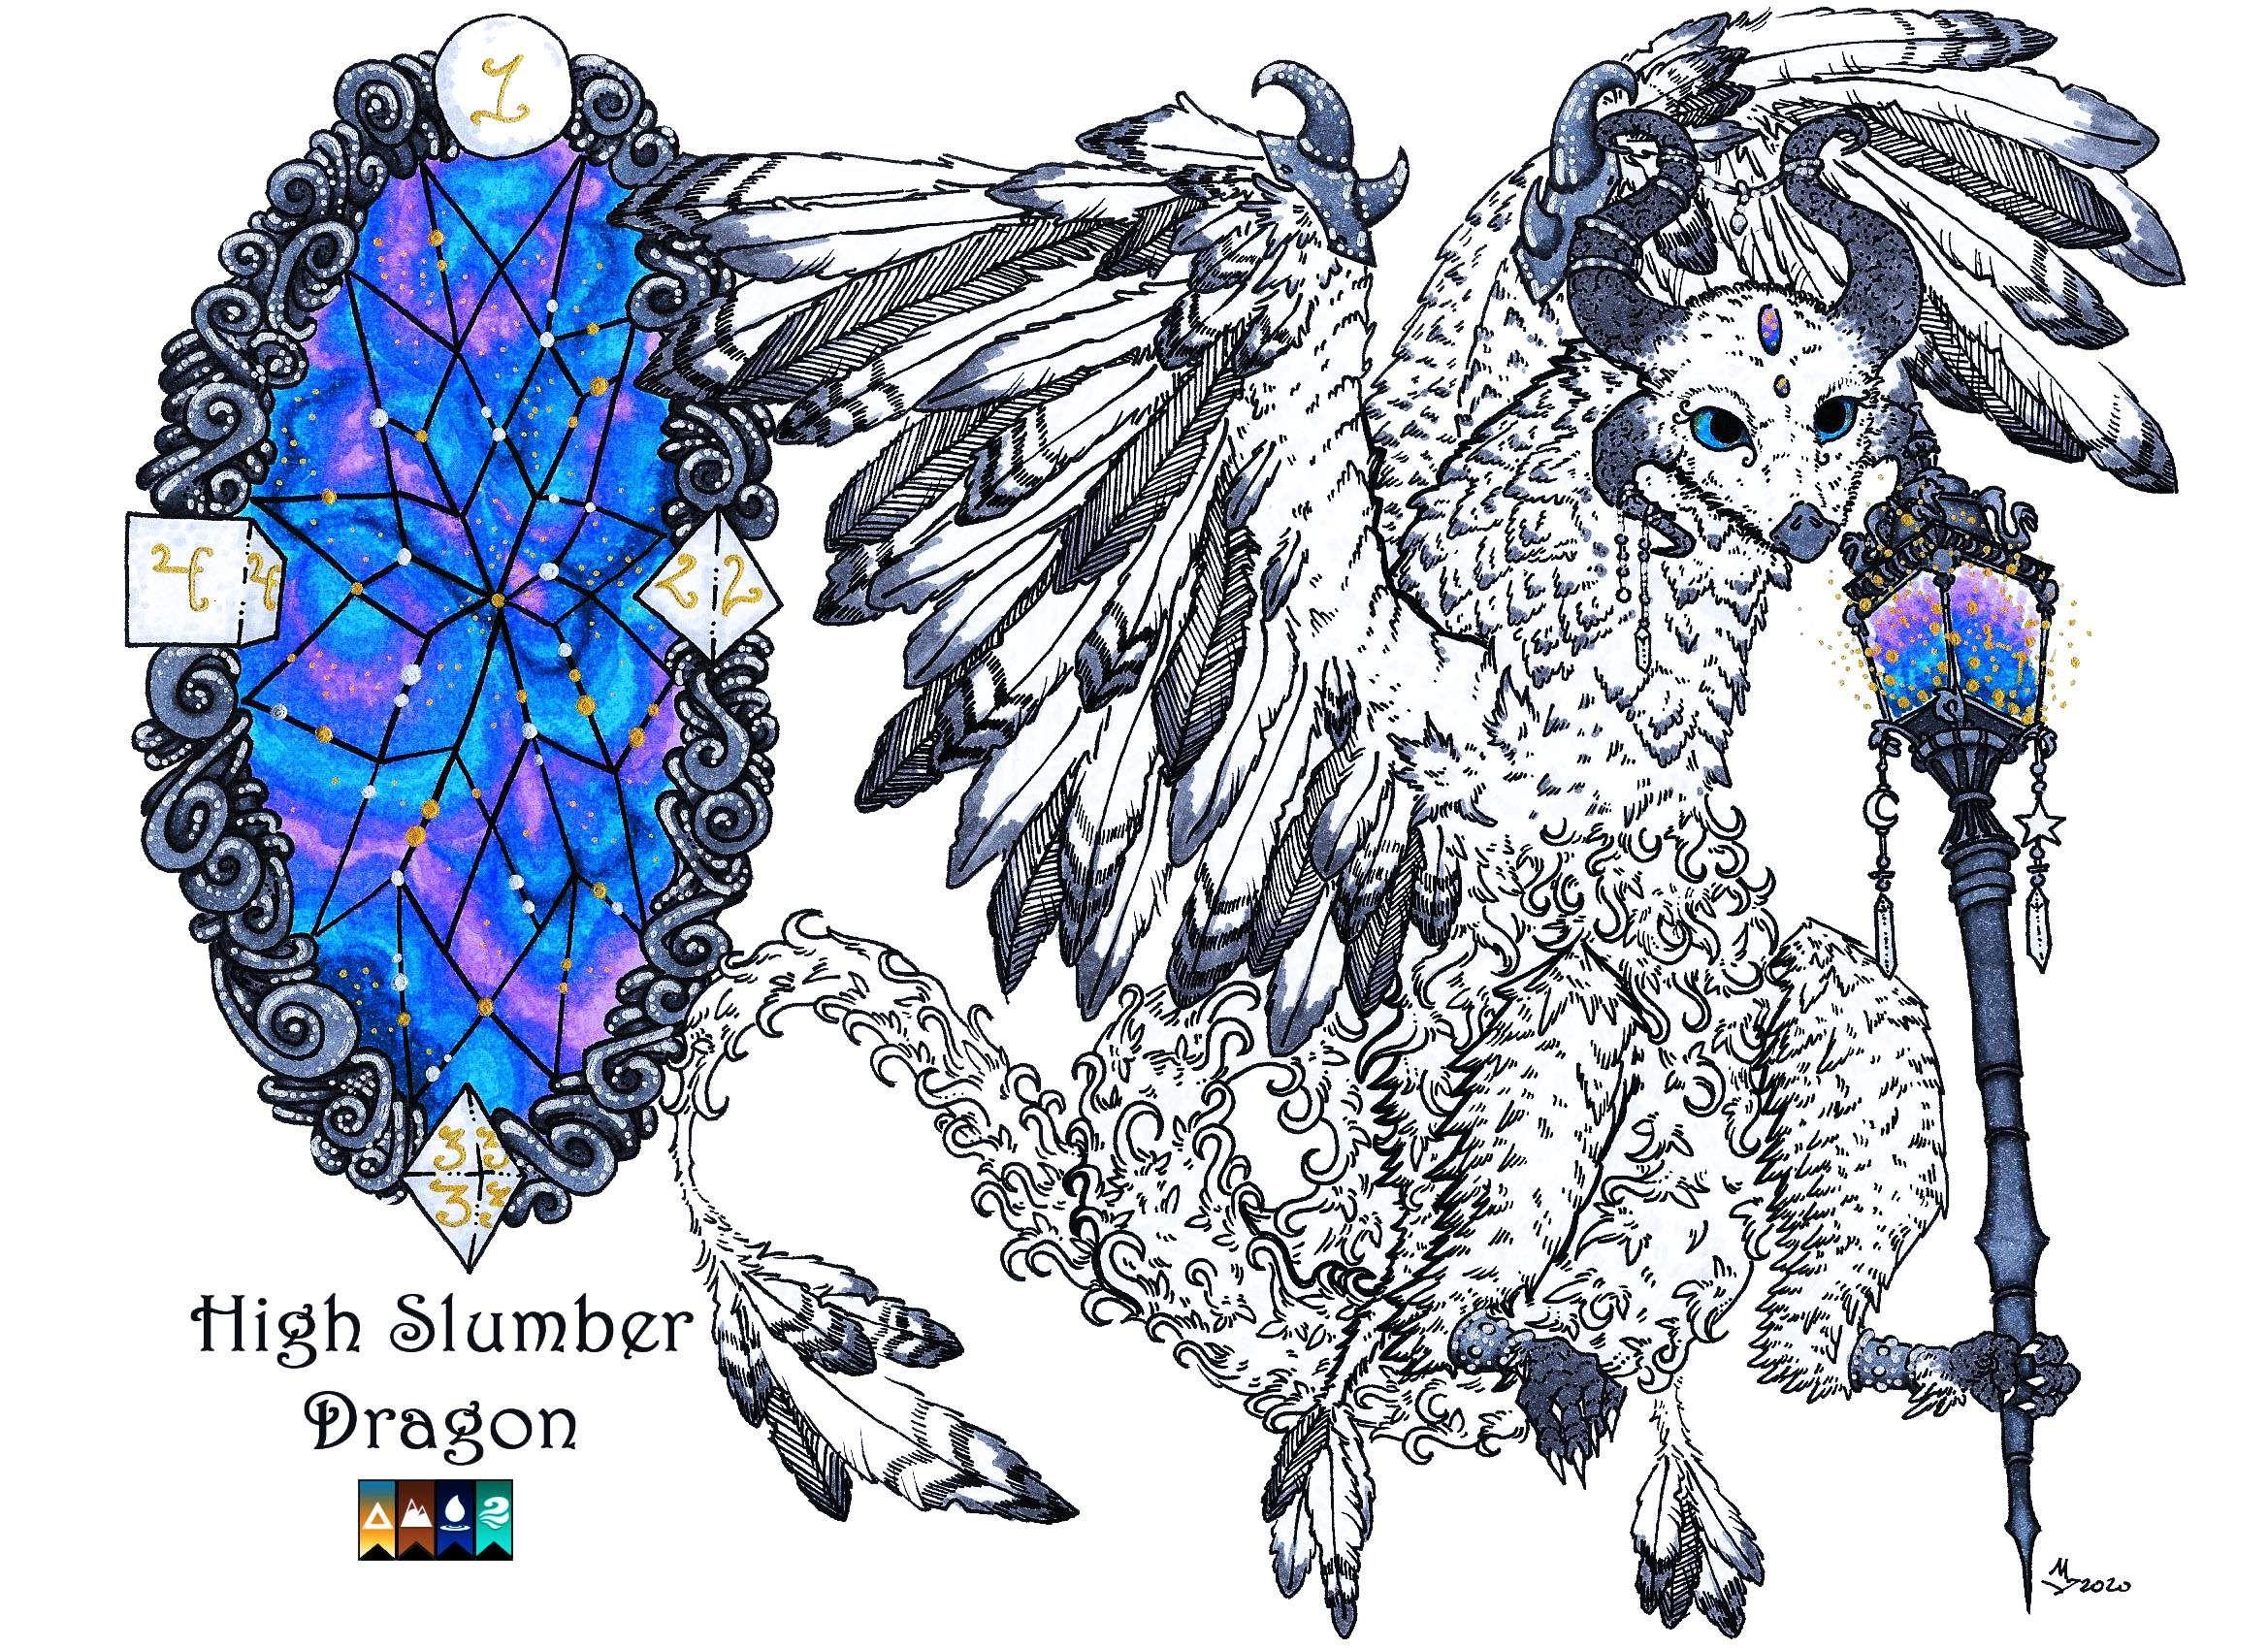 0_1614896823204_High Slumber Dragon, Anthony Valencia.jpg